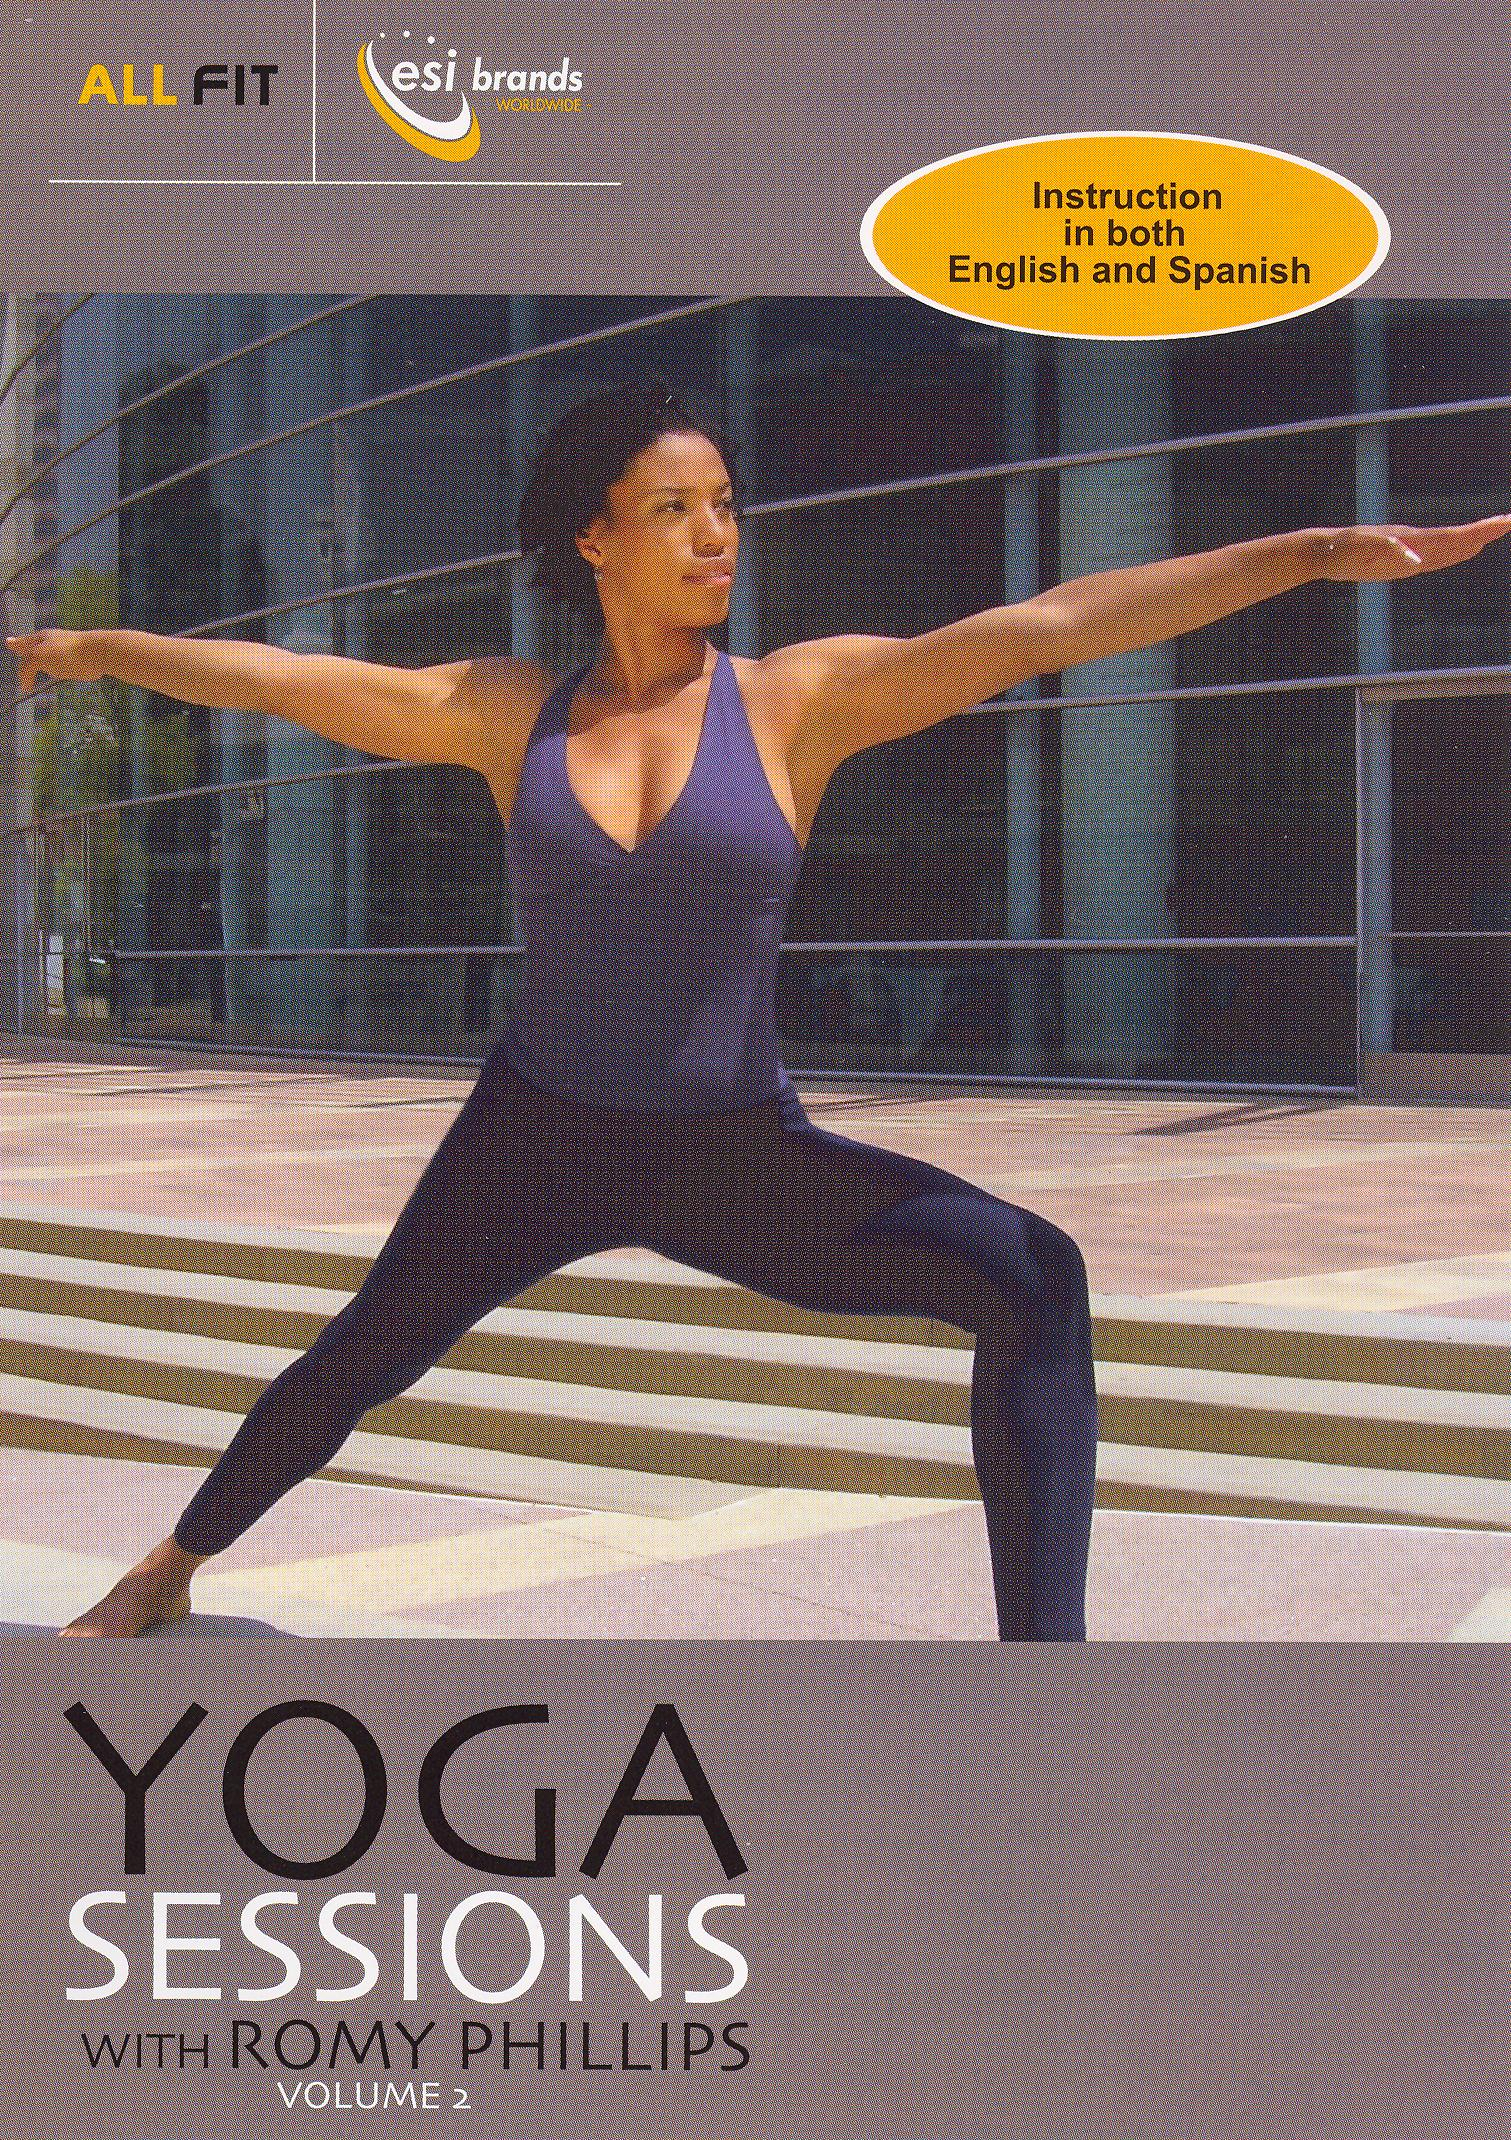 Romy Phillips: Yoga Sessions with Romy Phillips, Vol. 2